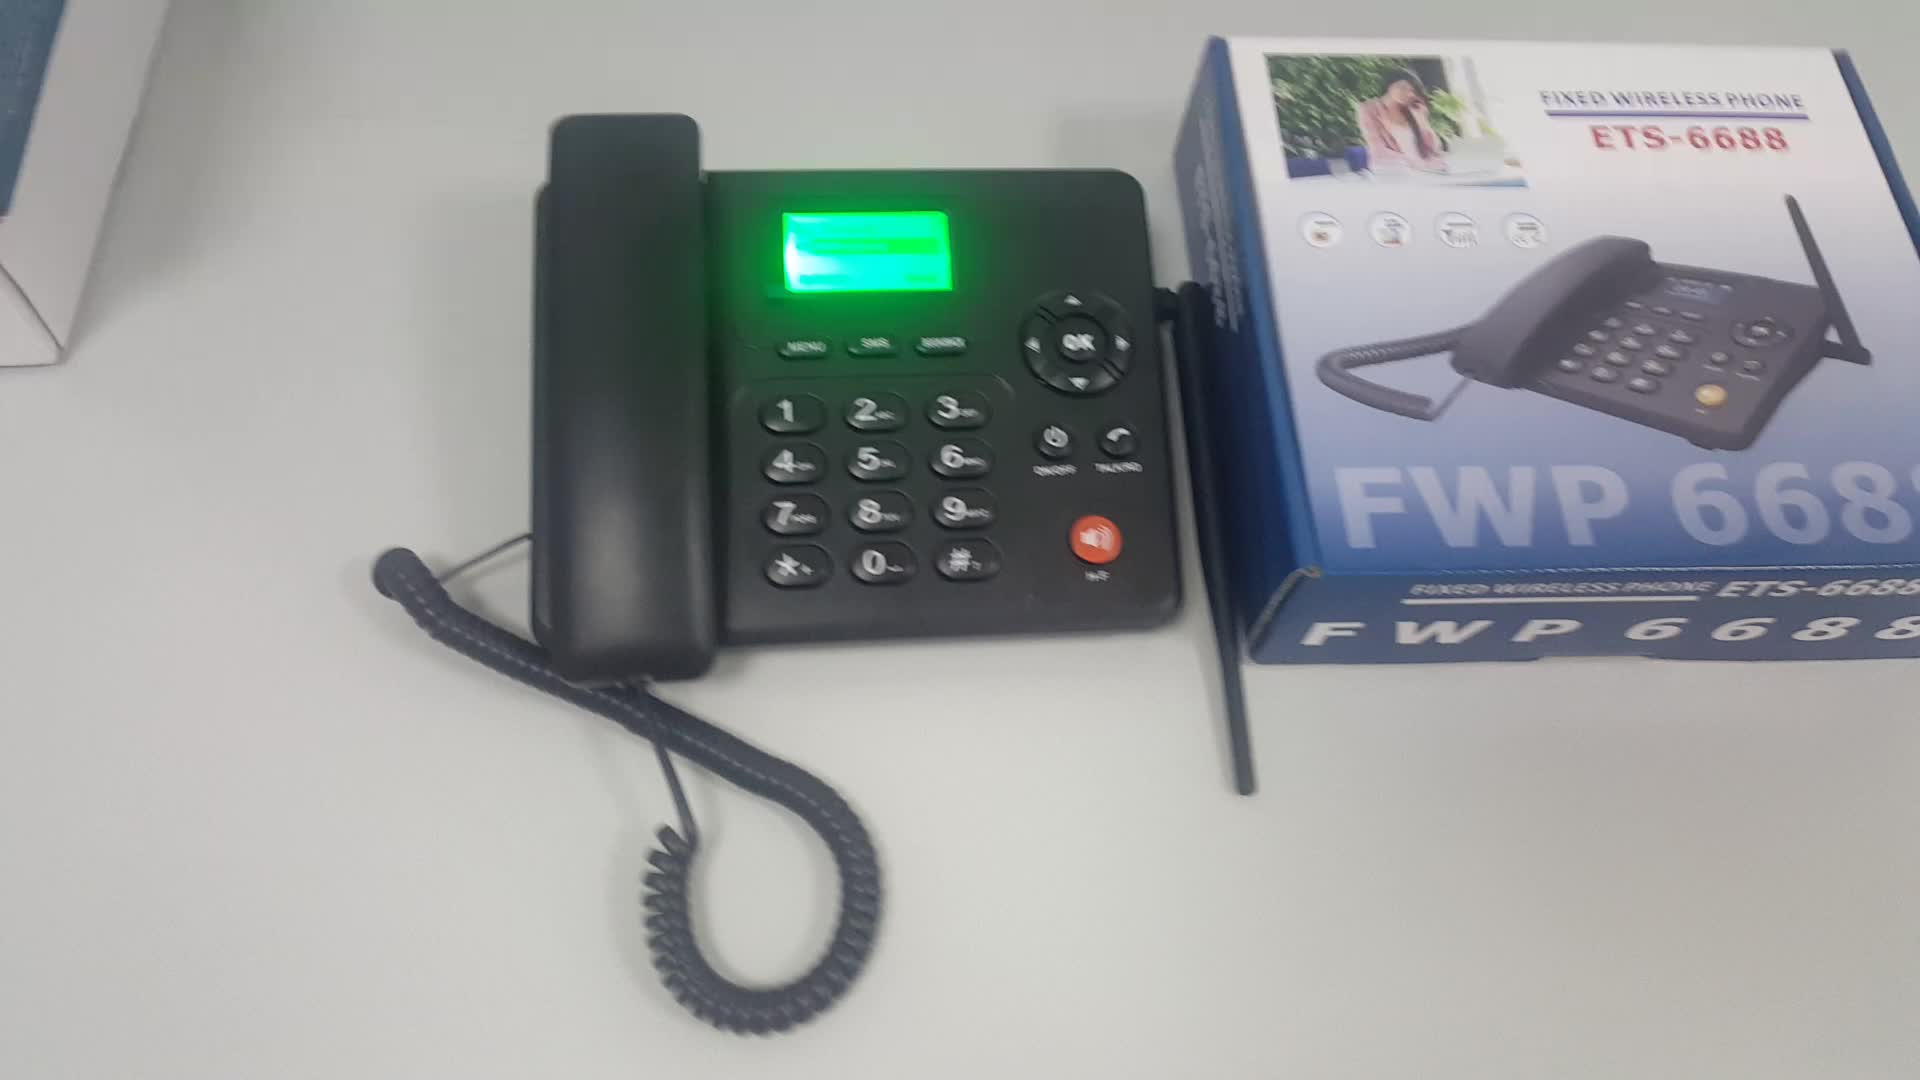 6188 6688 FWT ETS PHONES Sim Card Wireless Desk Phone